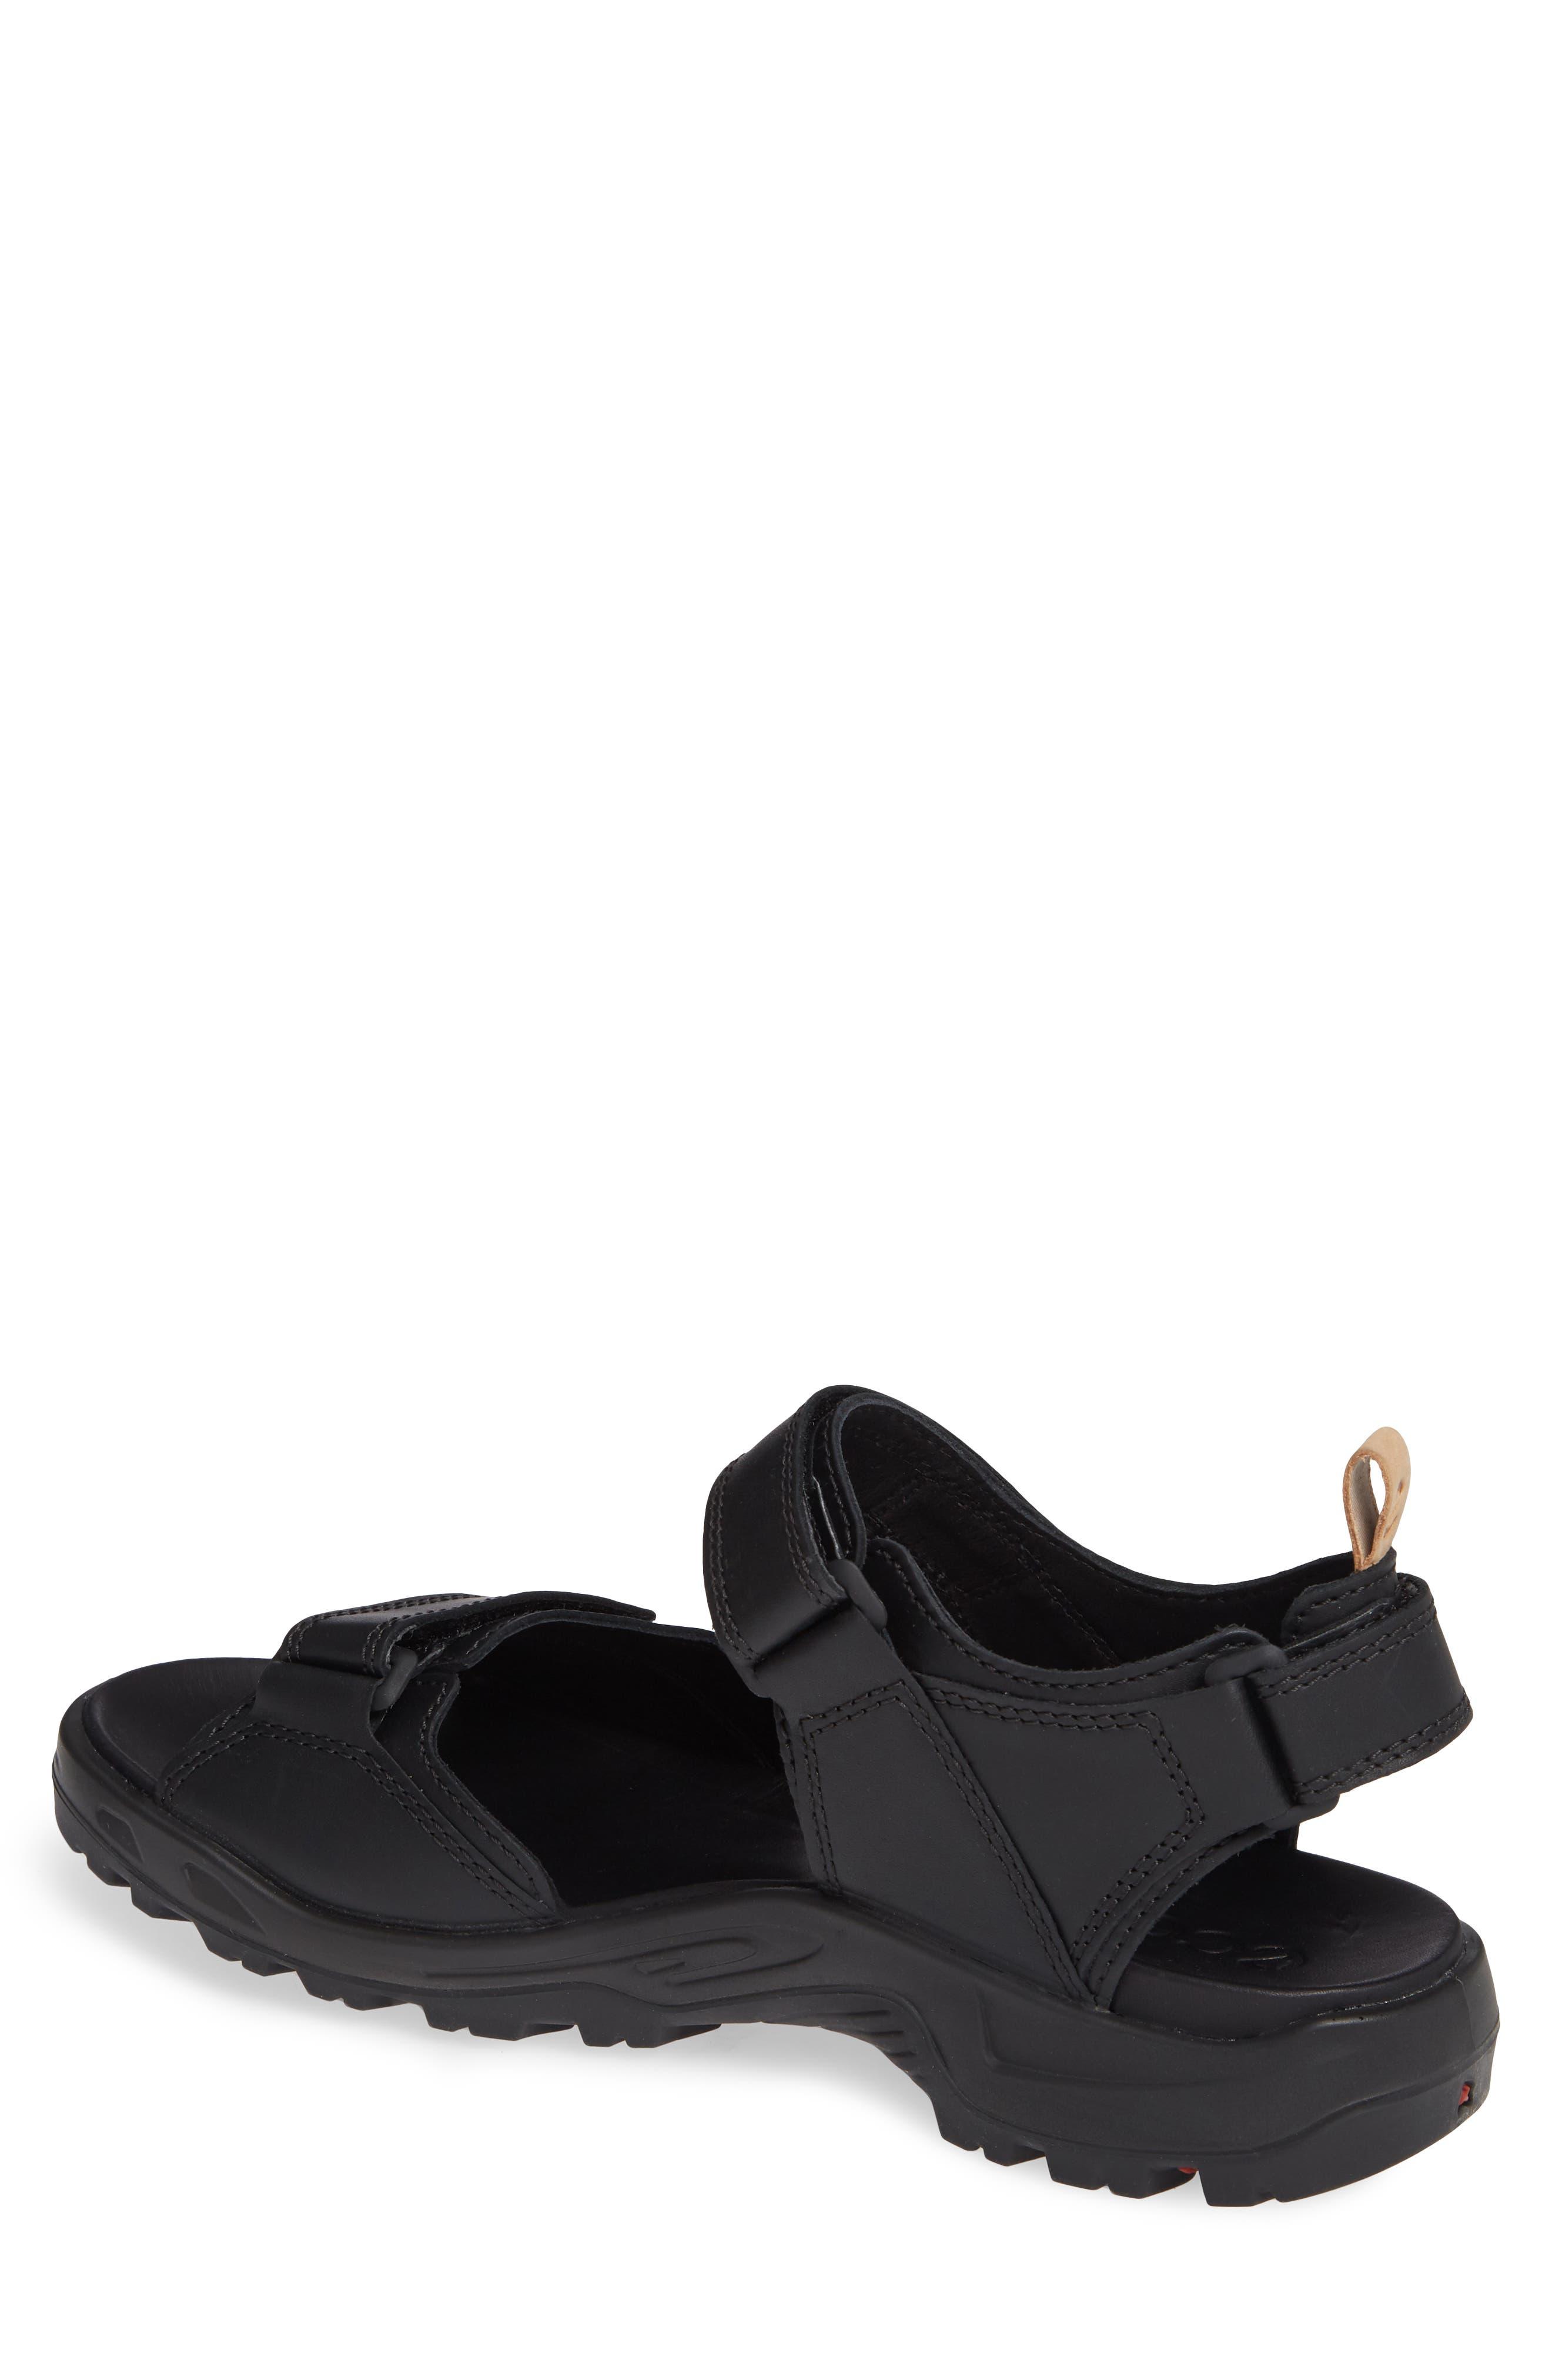 Premium Offroad Sandal,                             Alternate thumbnail 2, color,                             BLACK LEATHER